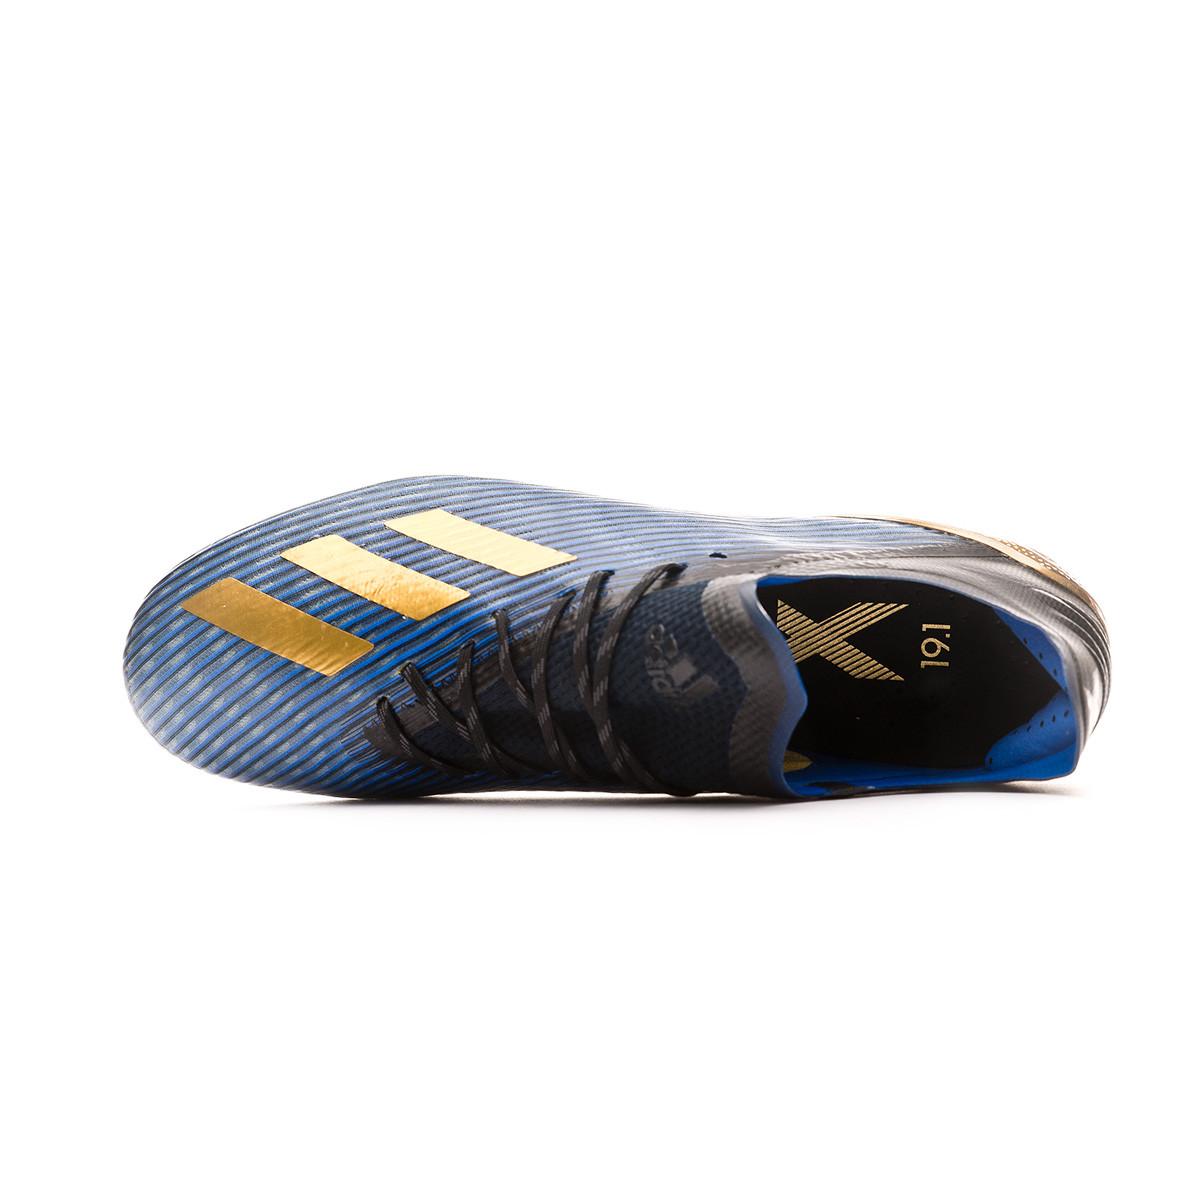 Chaussure de foot adidas X 19.1 FG